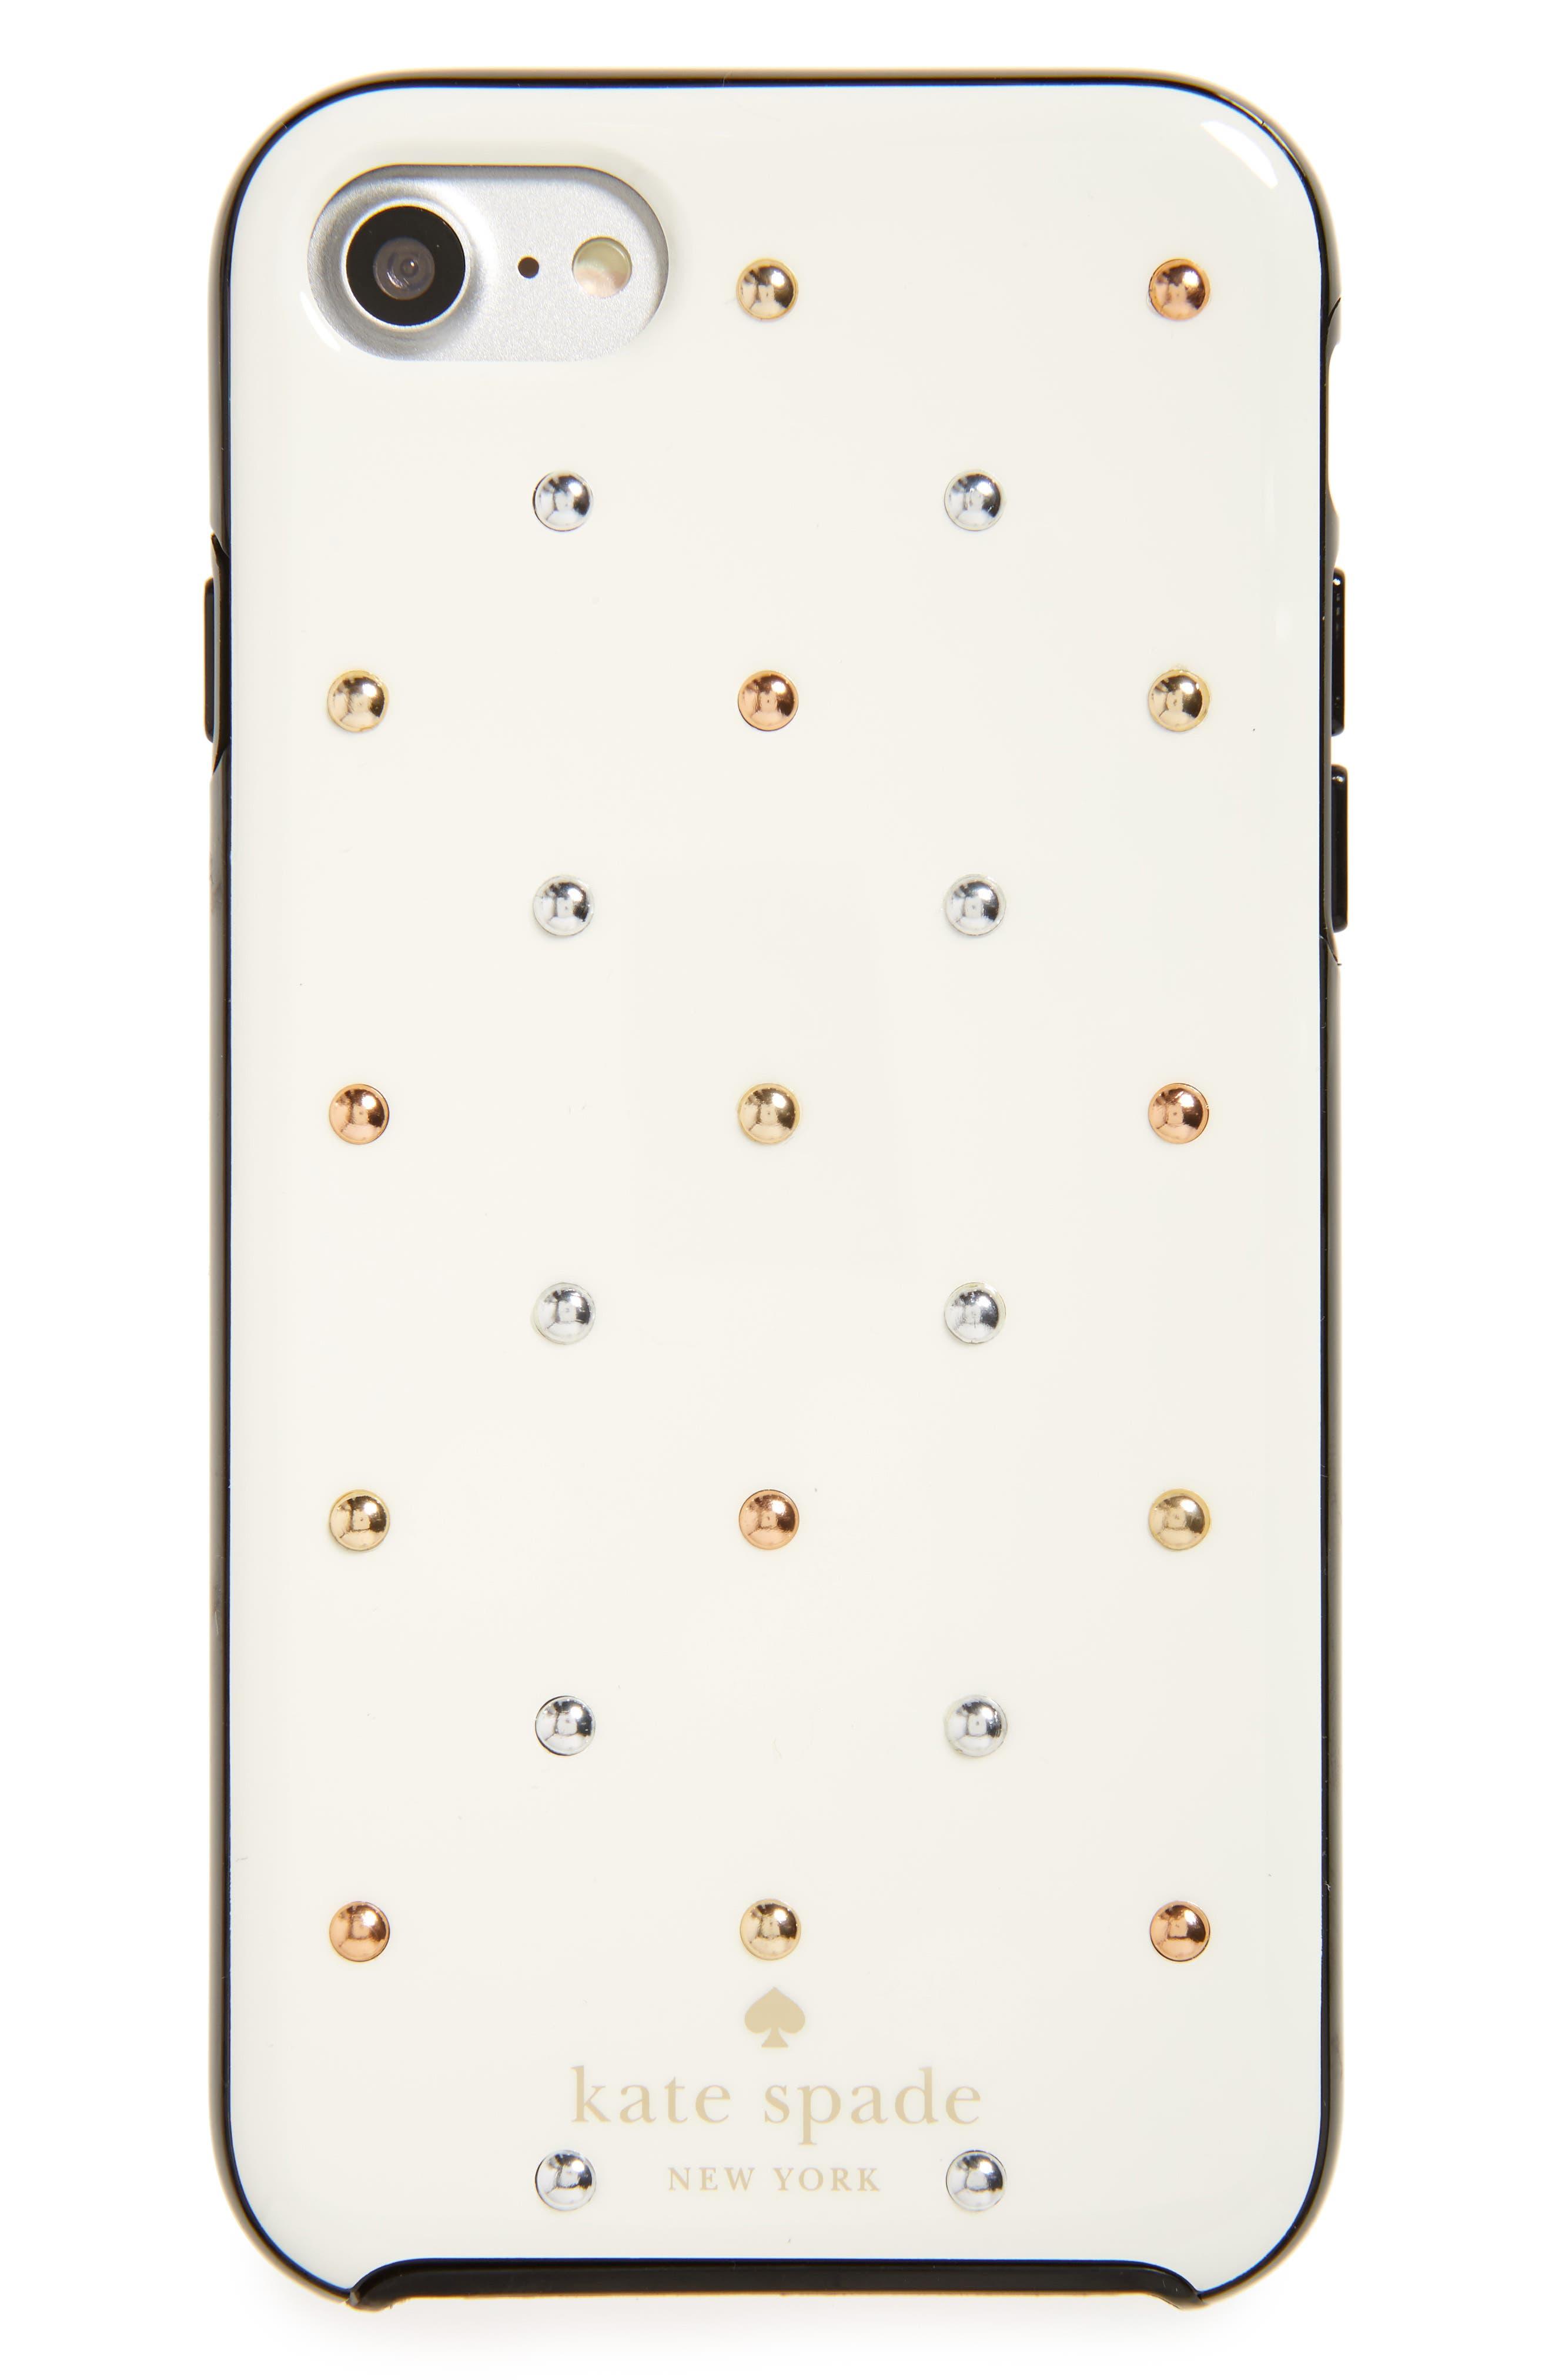 KATE SPADE NEW YORK larabee dot iPhone 7 & 7 Plus case